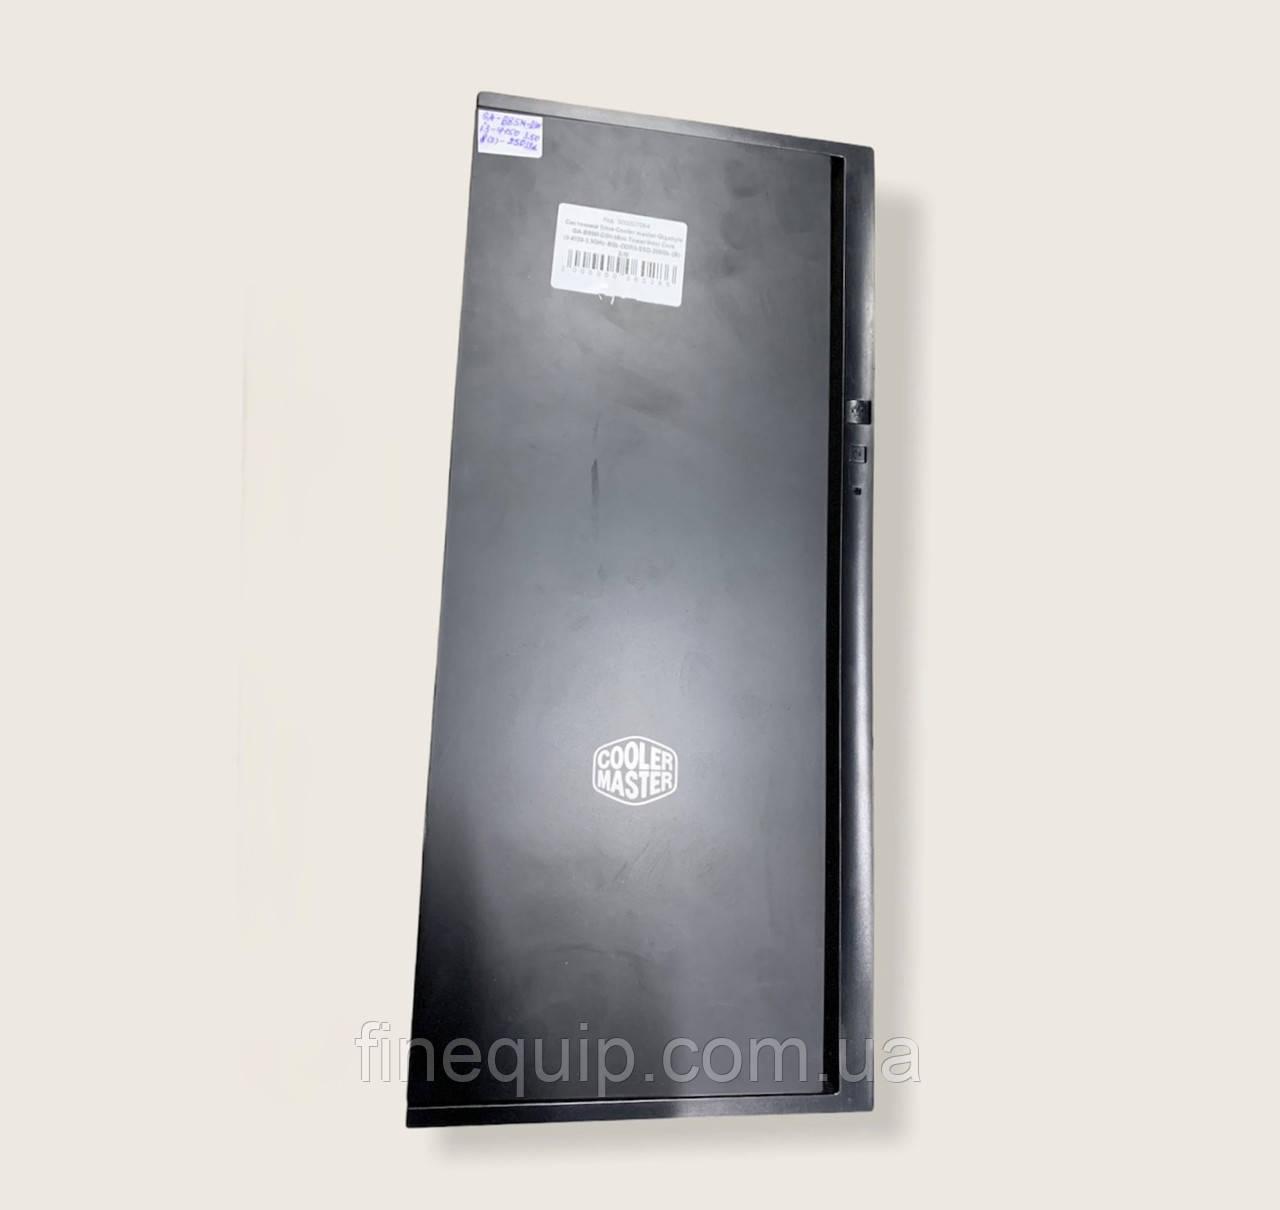 Системный блок-Cooler master-Gigabyte GA-B85M-D3H-Mini-Tower-Intel Core i3-4150-3,5GHz-8Gb-DDR3-SSD-250Gb-(B)-